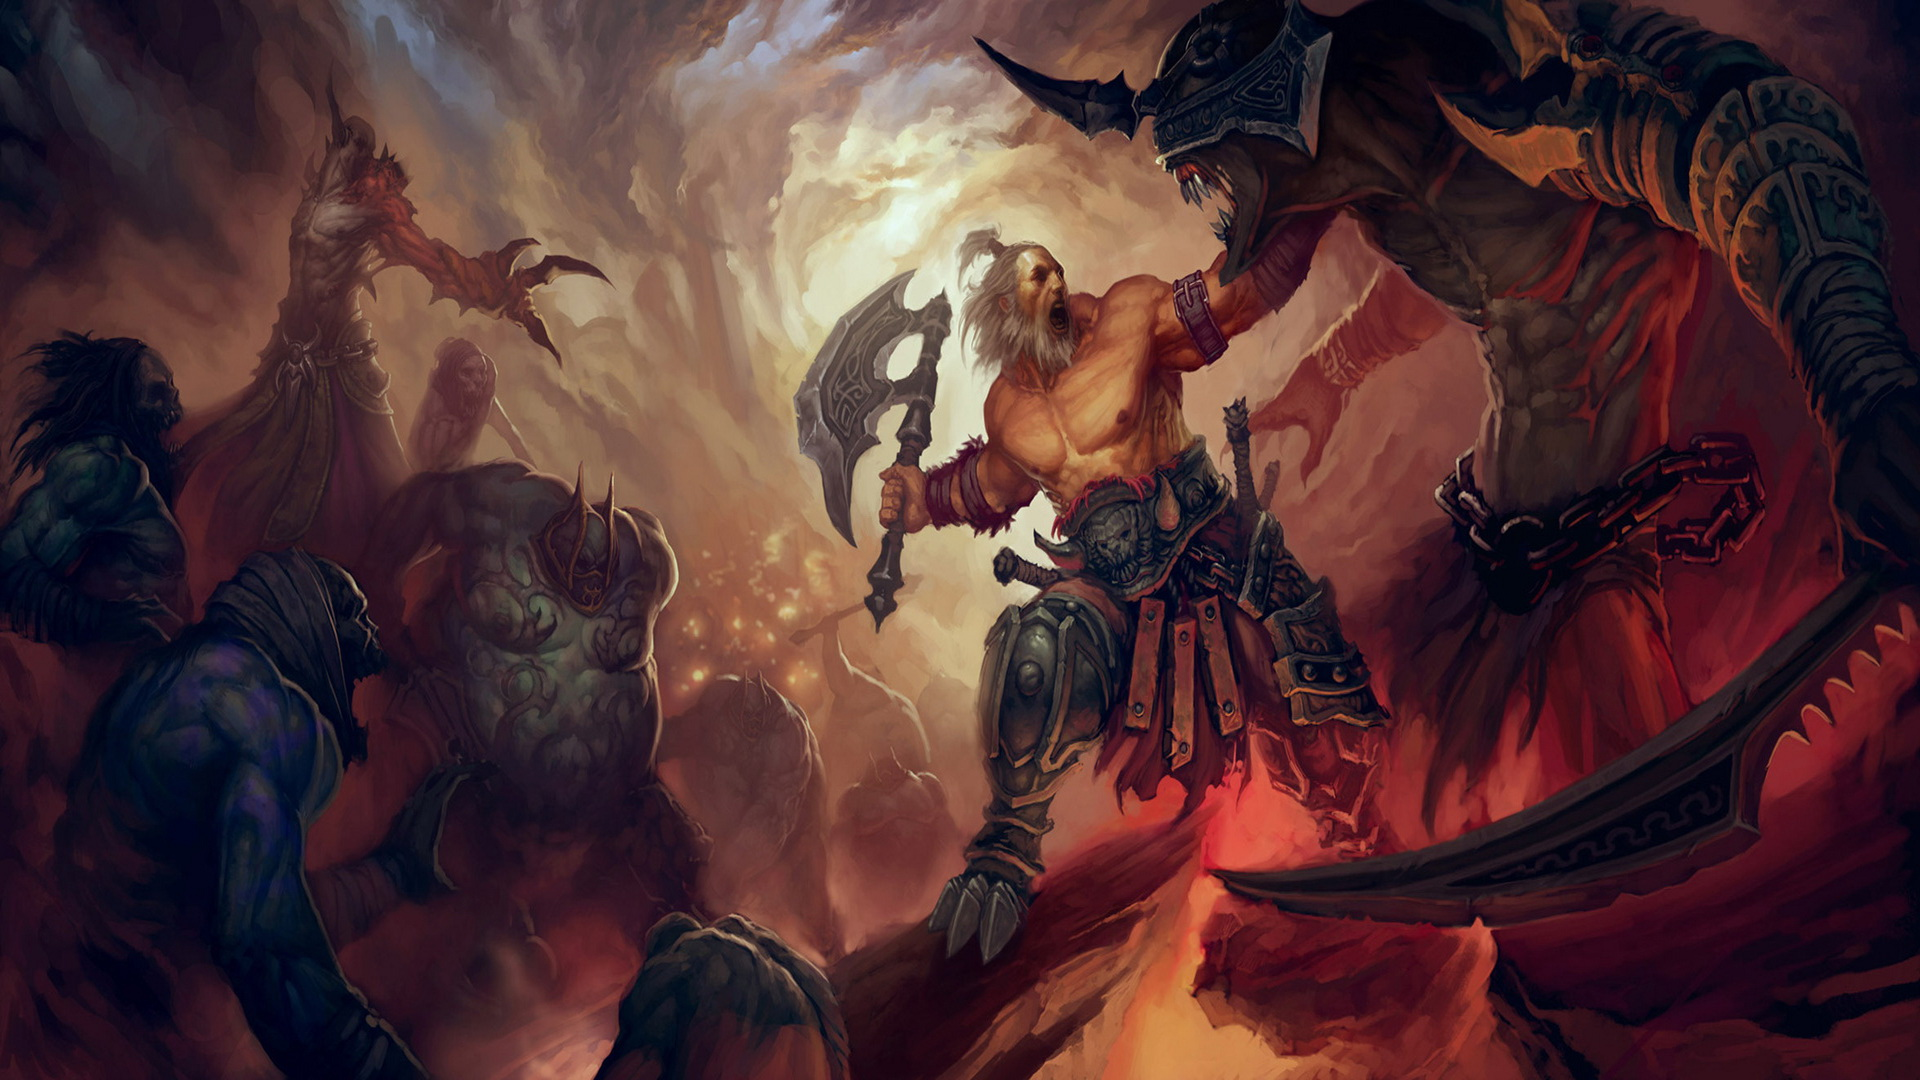 Diablo 3 Wallpaper Diablo a barbarianjpg 1920x1080